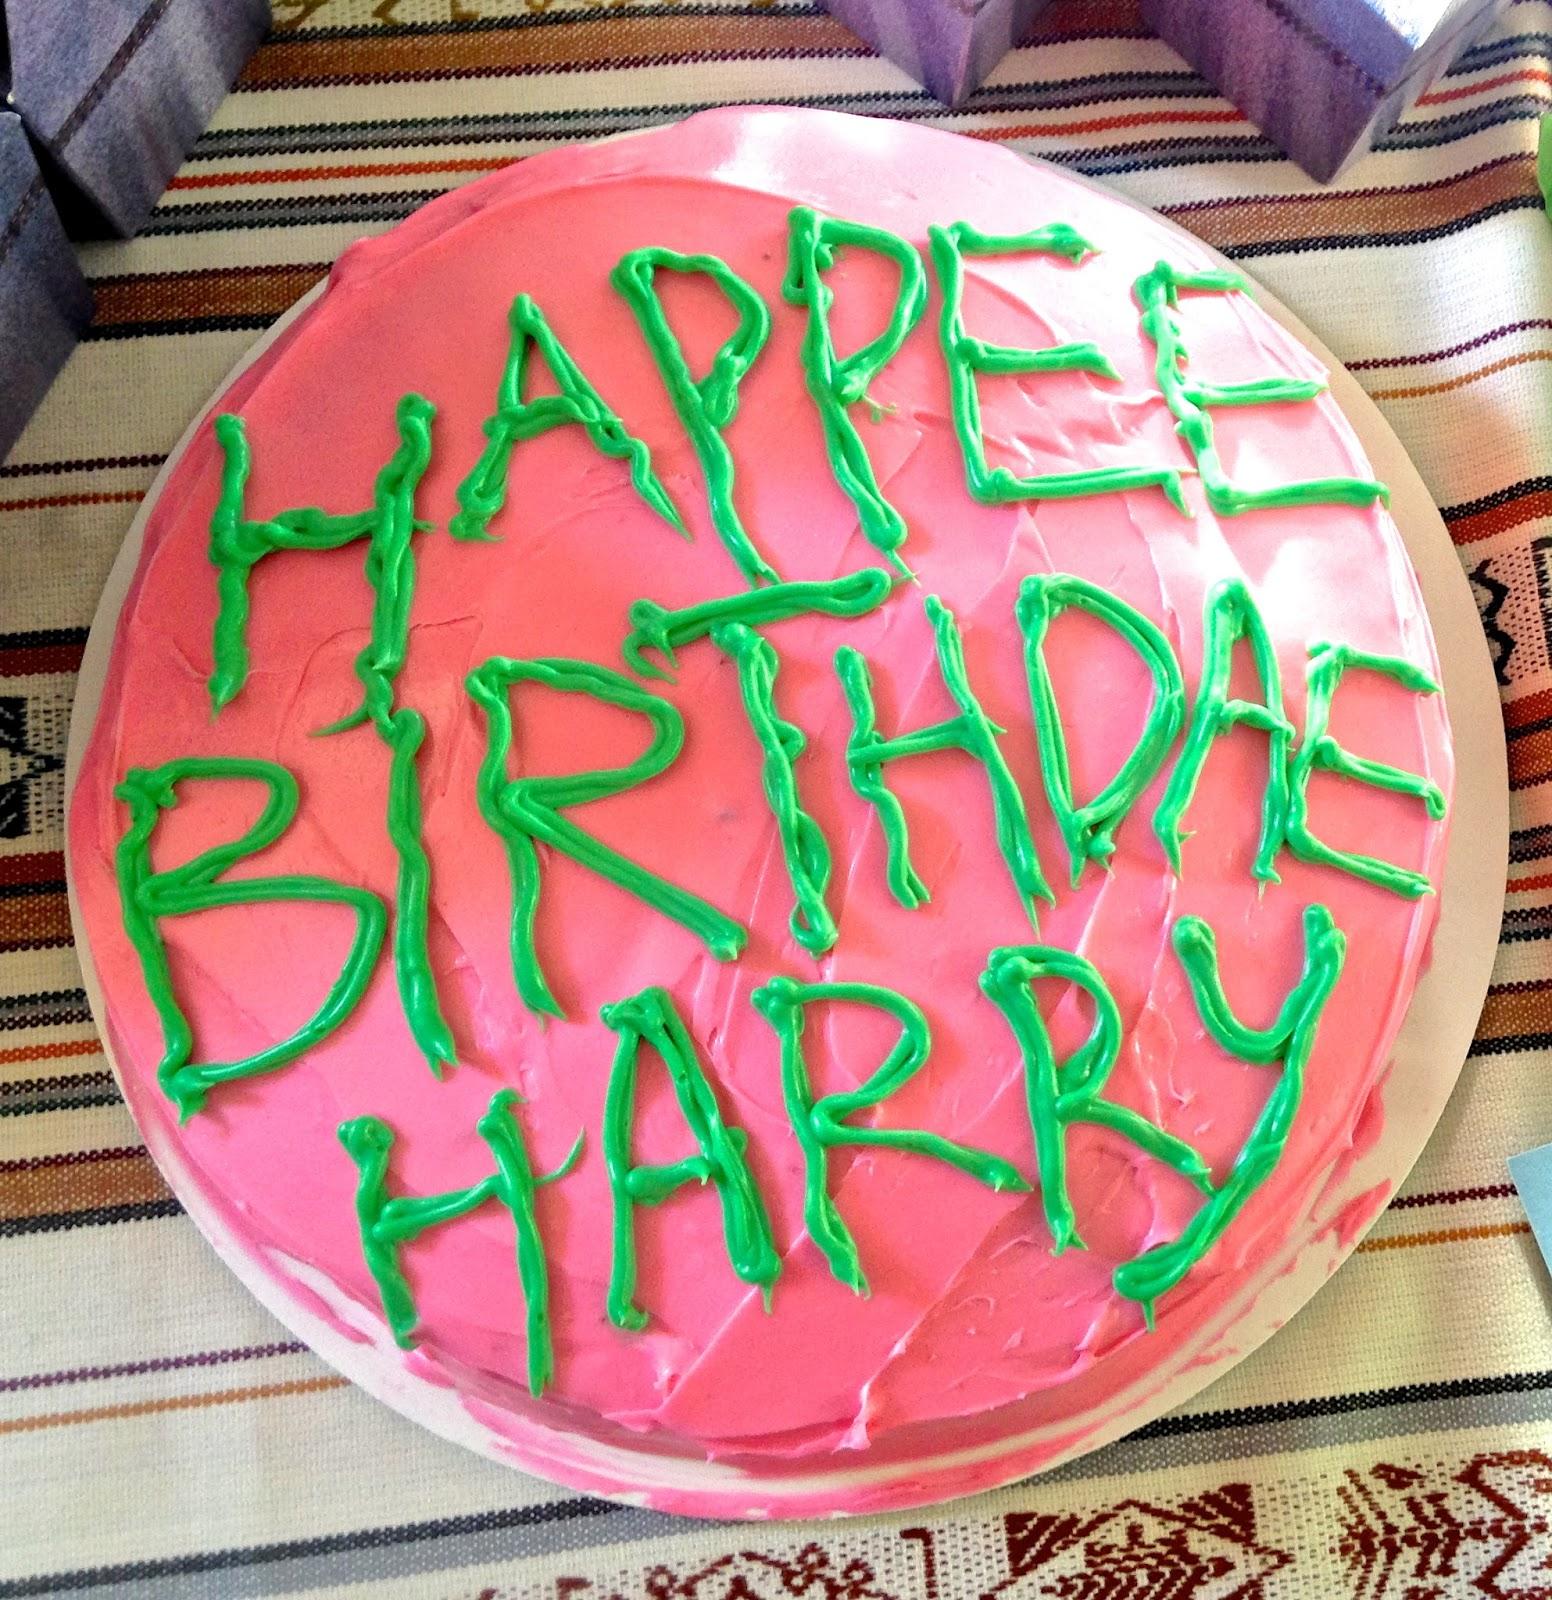 Happy Birthday Harry Potter Cake Bessemsthielens